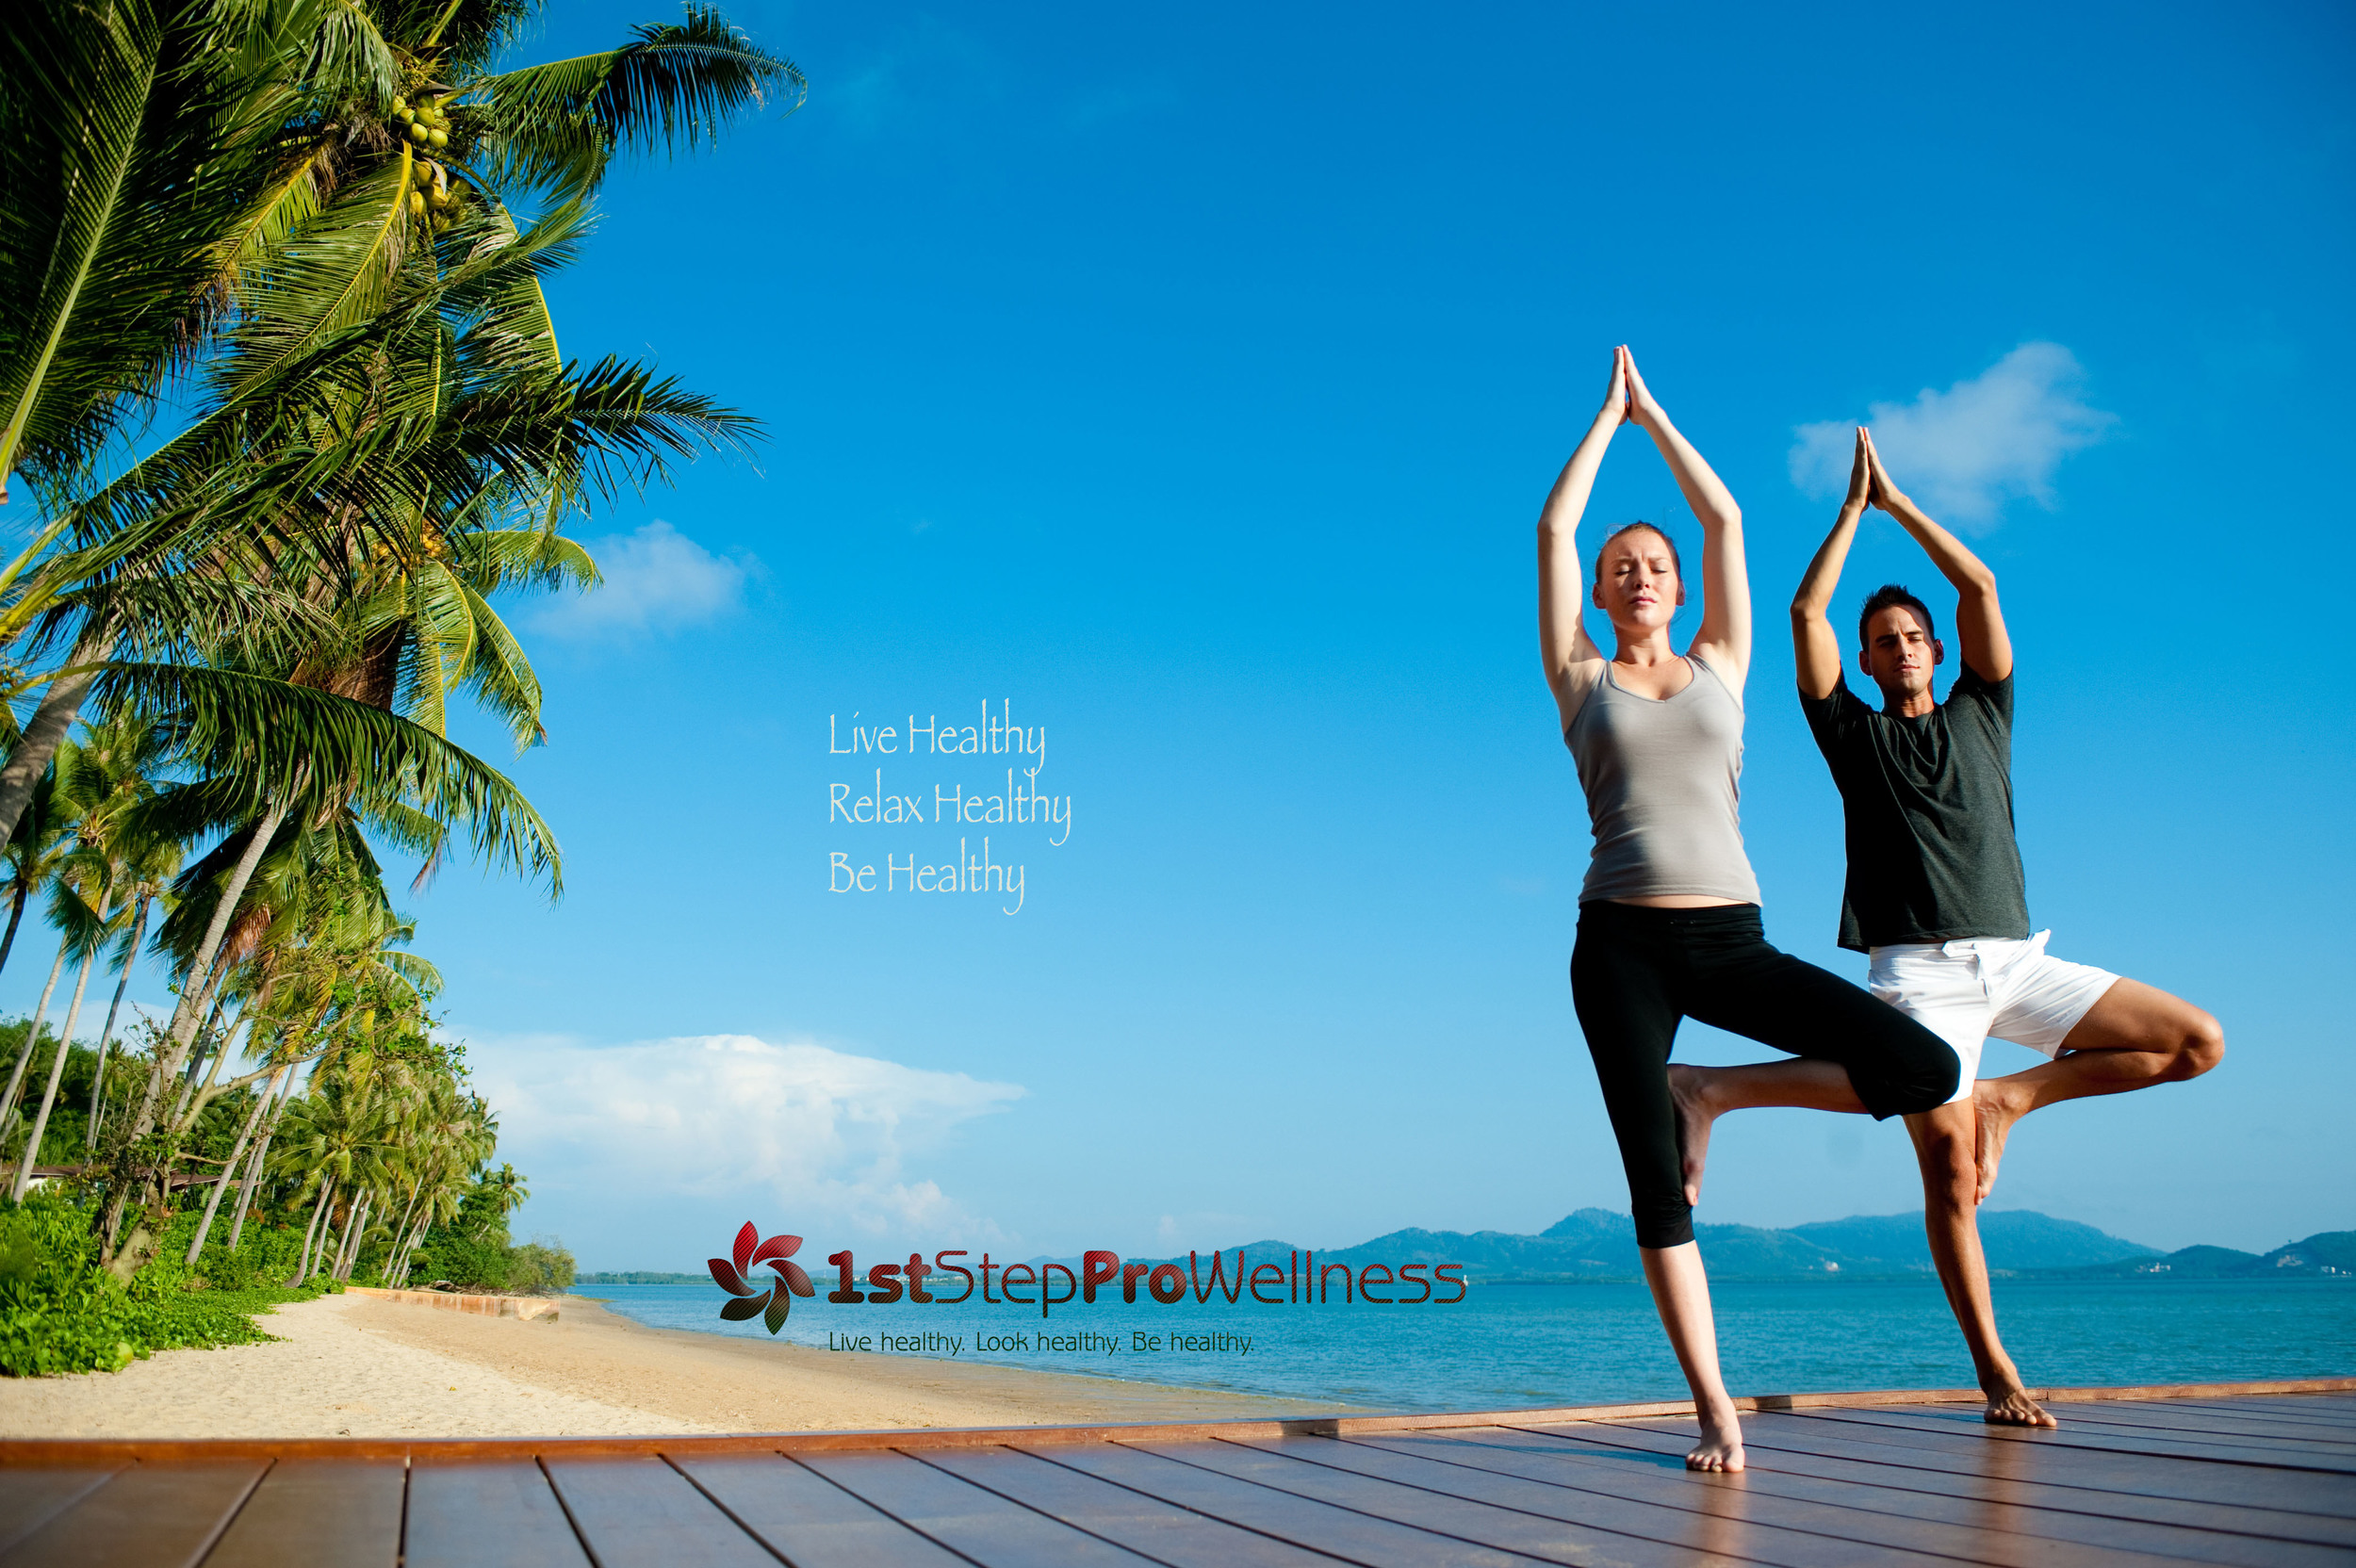 1st Step ProWellness Multivitamin